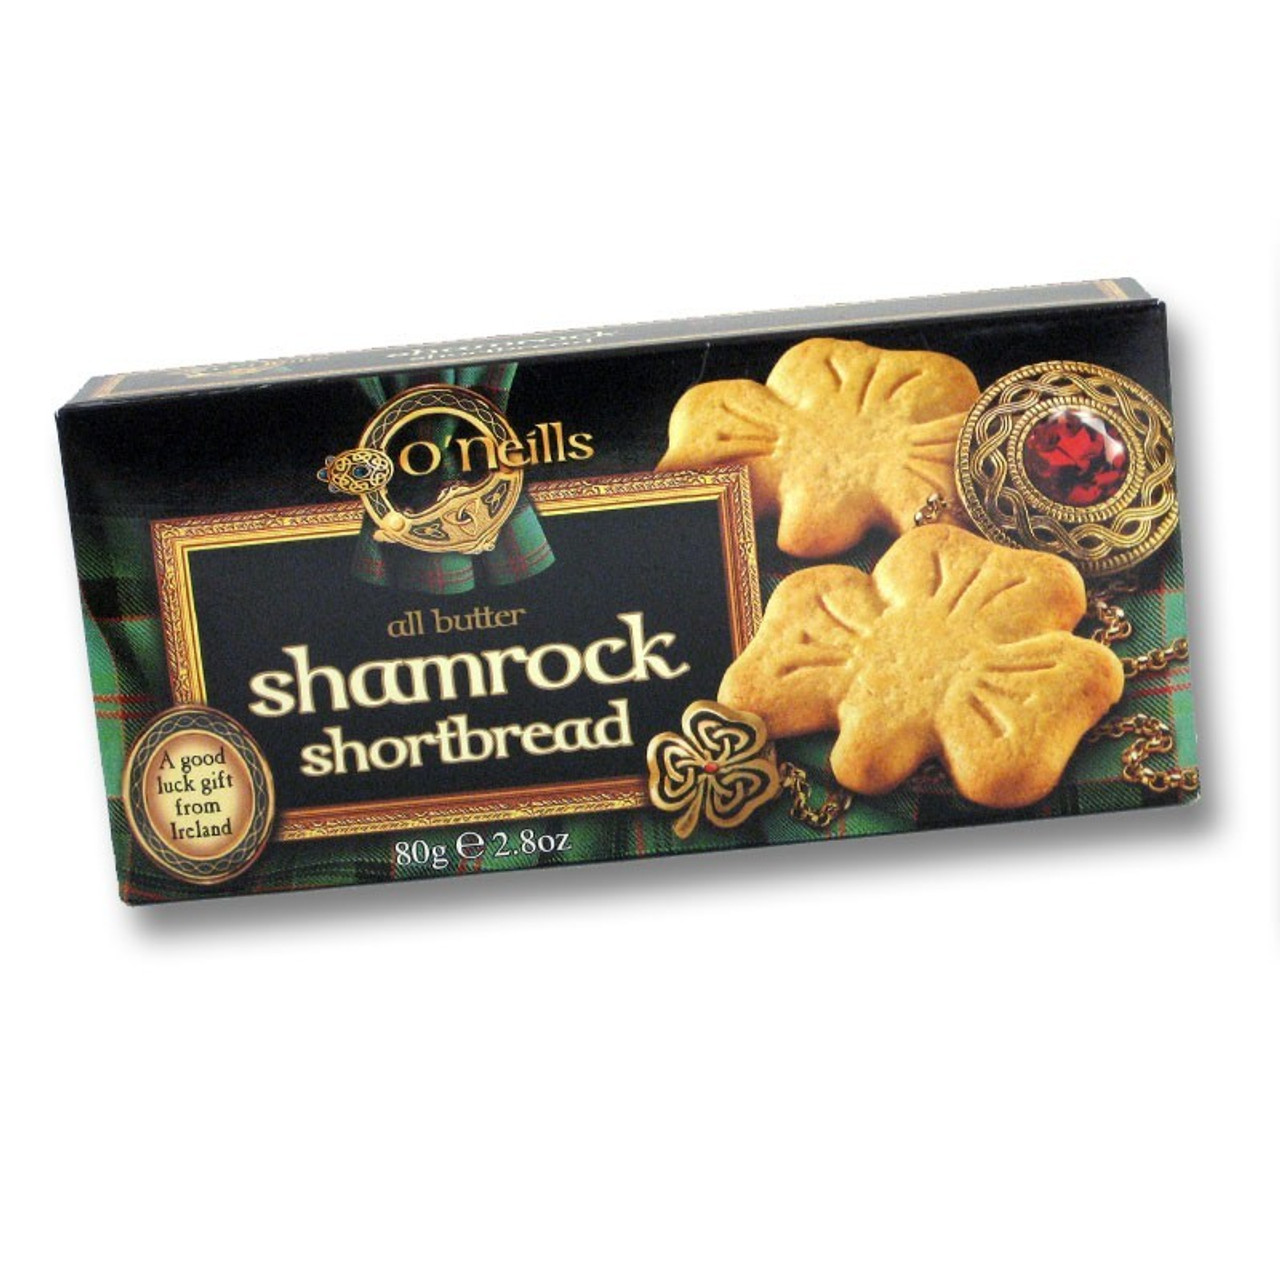 O'Neills Shamrock Shortbread Mix - Imported from Ireland